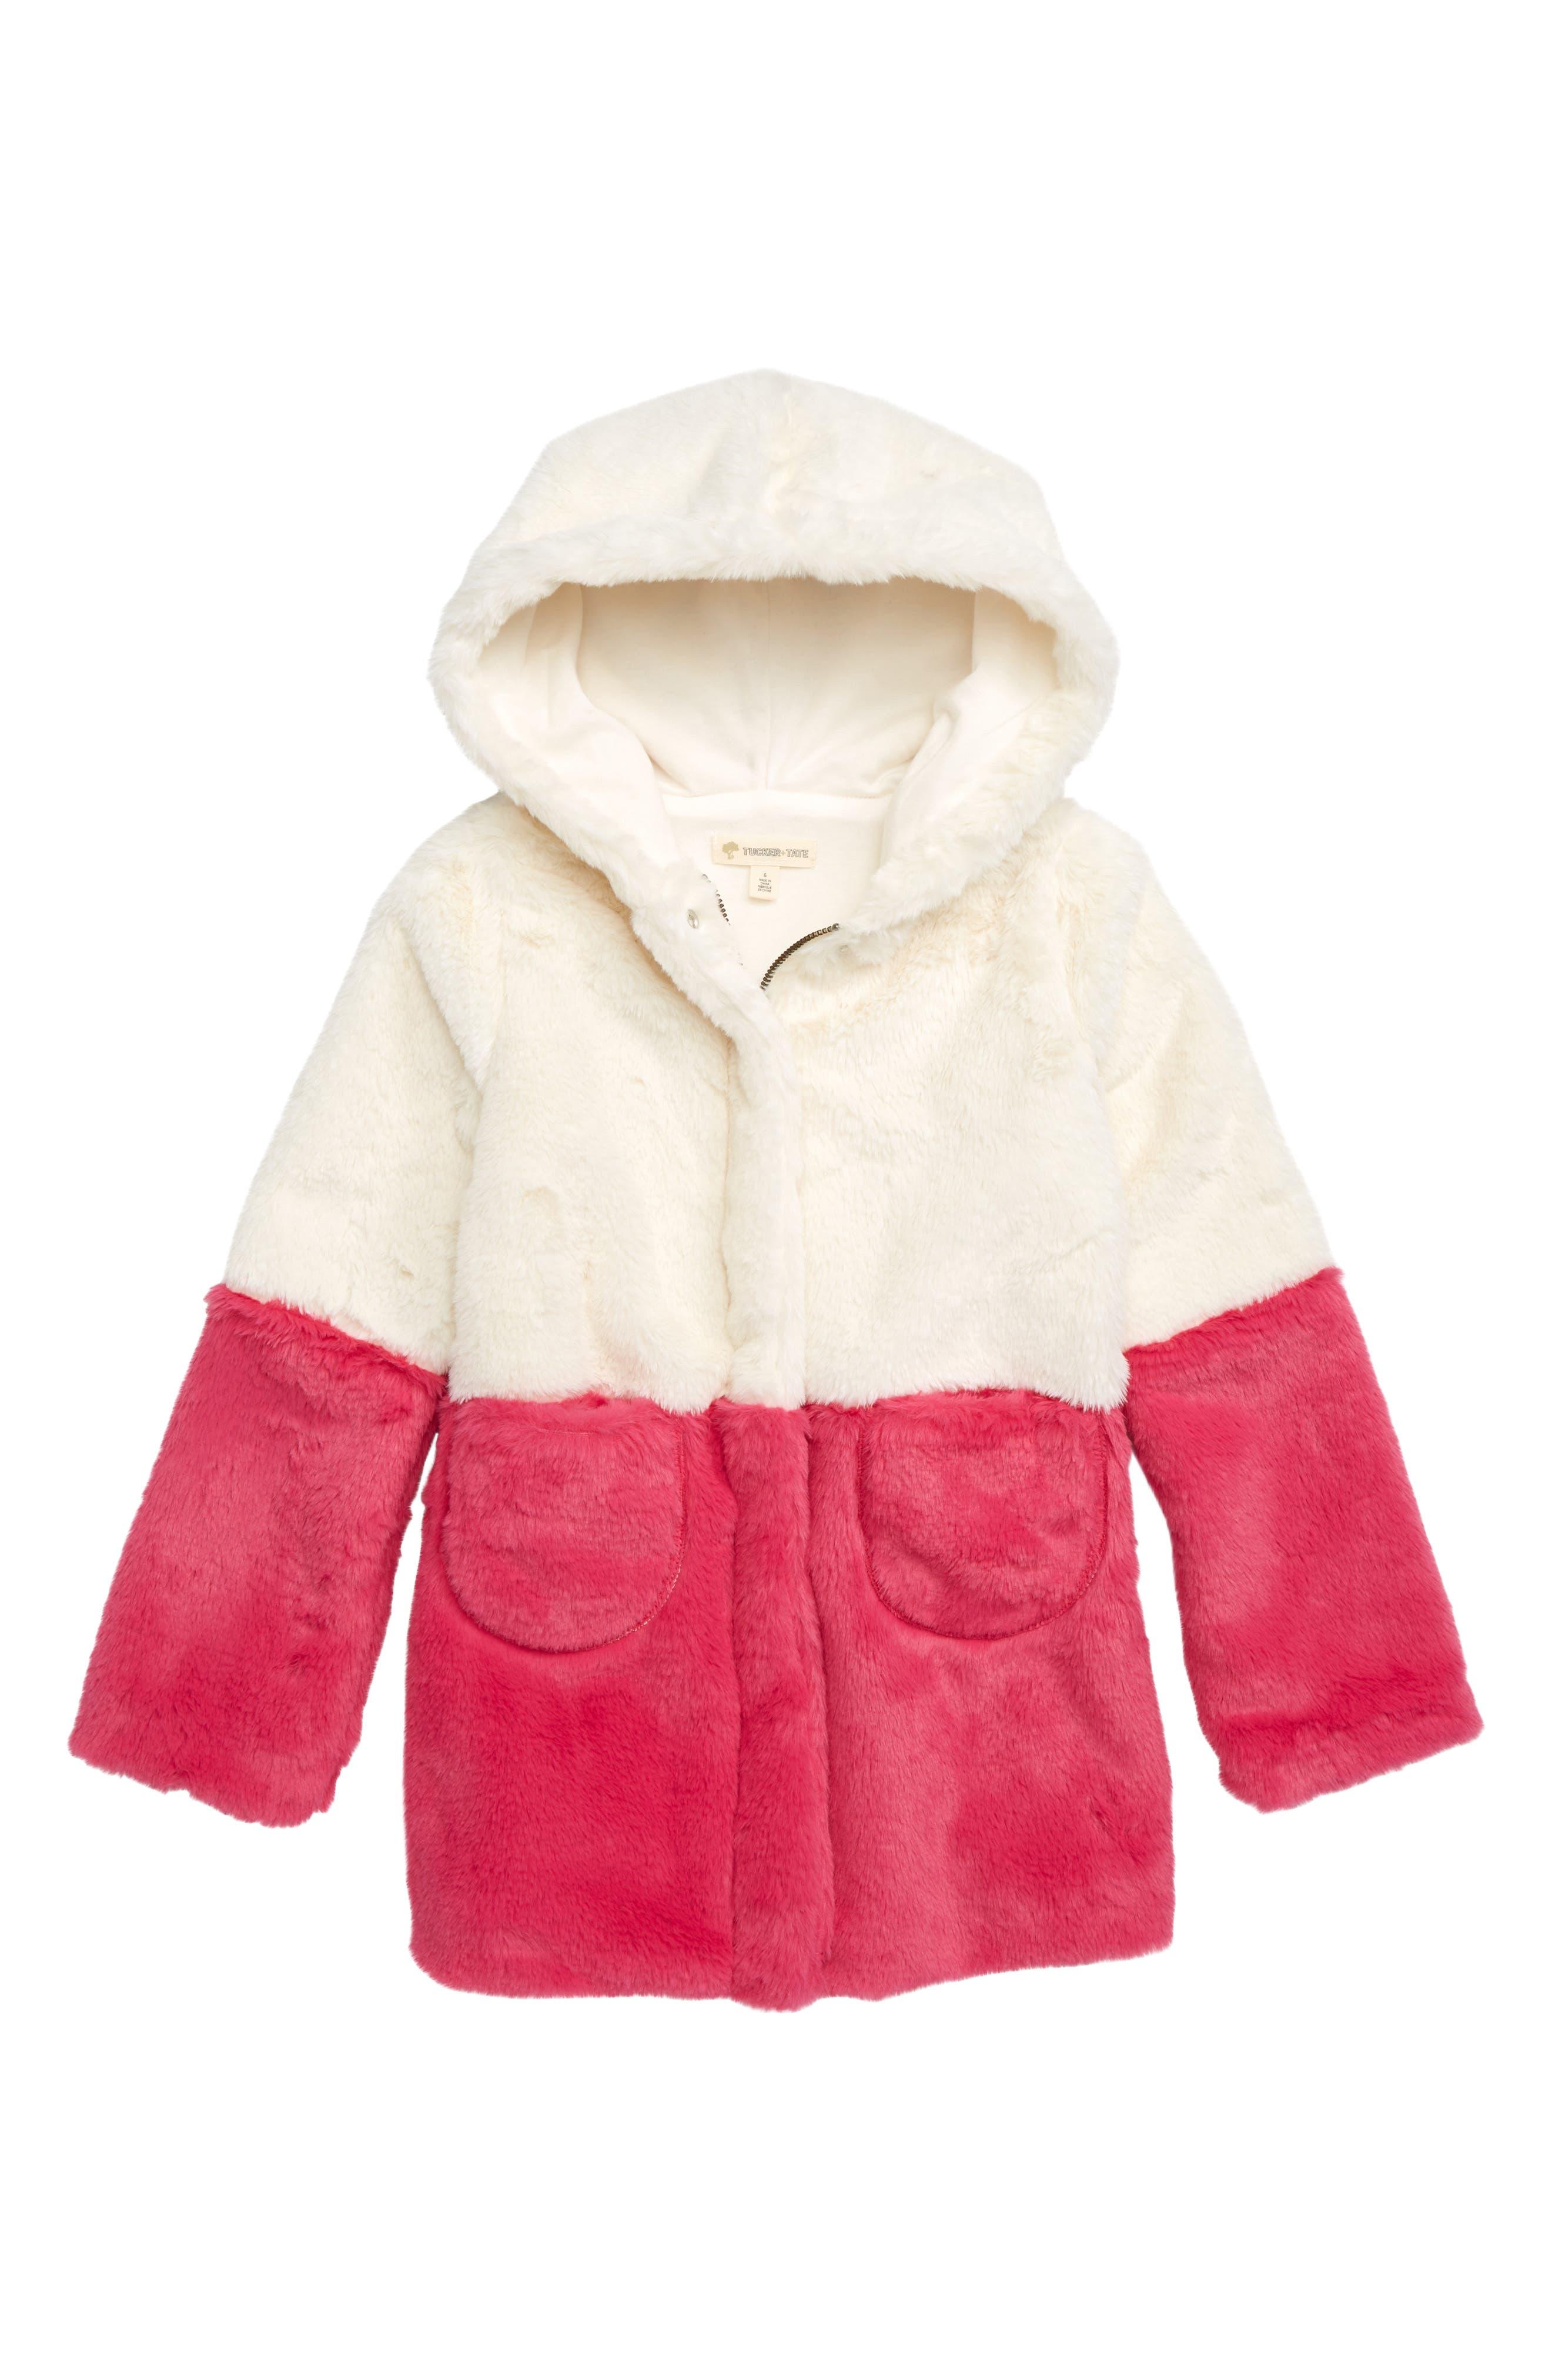 Coloblock Faux Fur Jacket,                         Main,                         color, IVORY EGRET- PINK